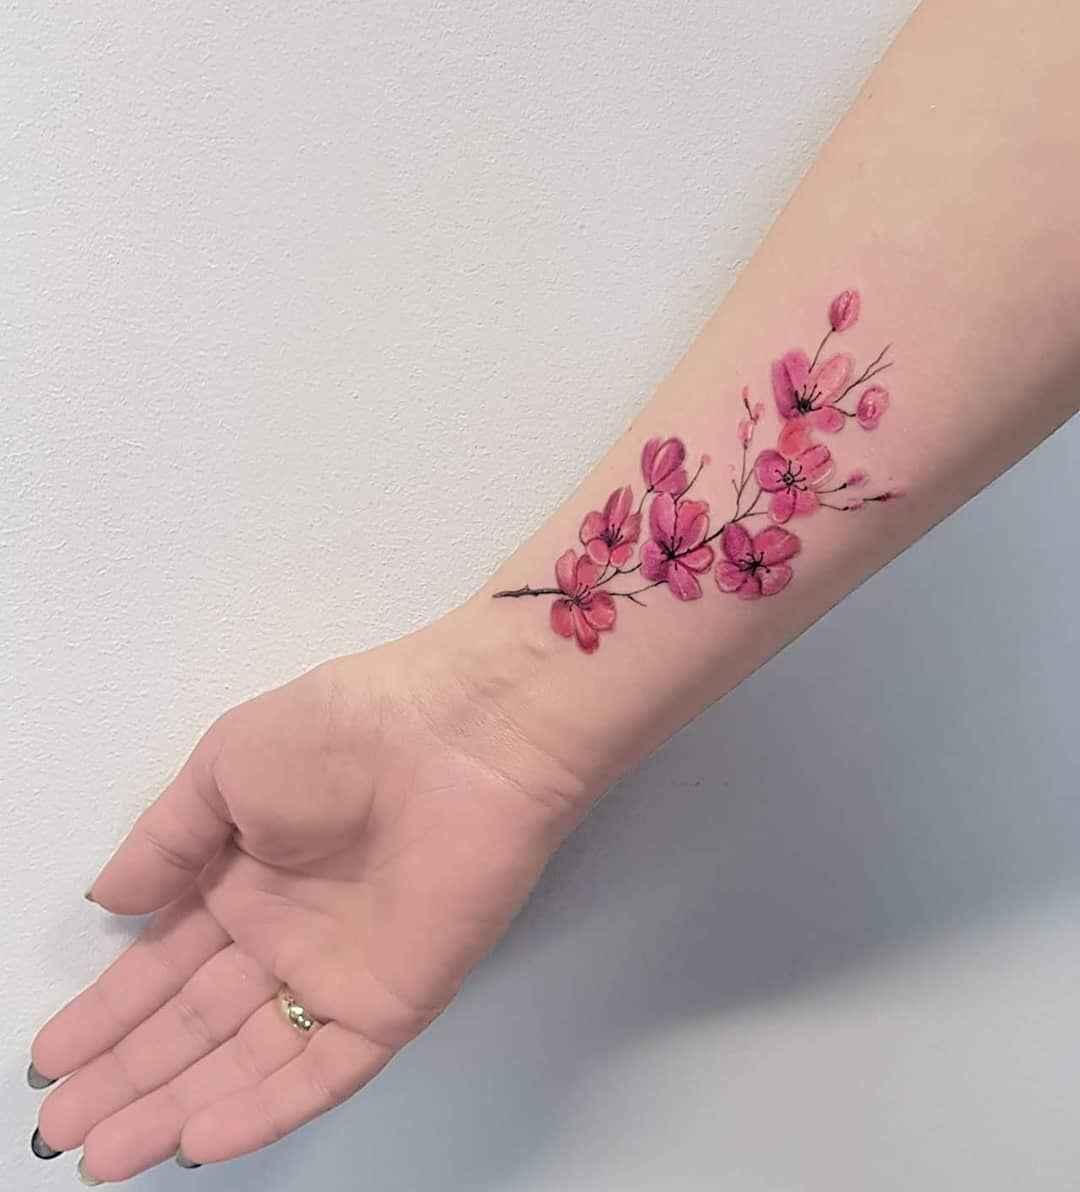 женское тату сакура фото_10